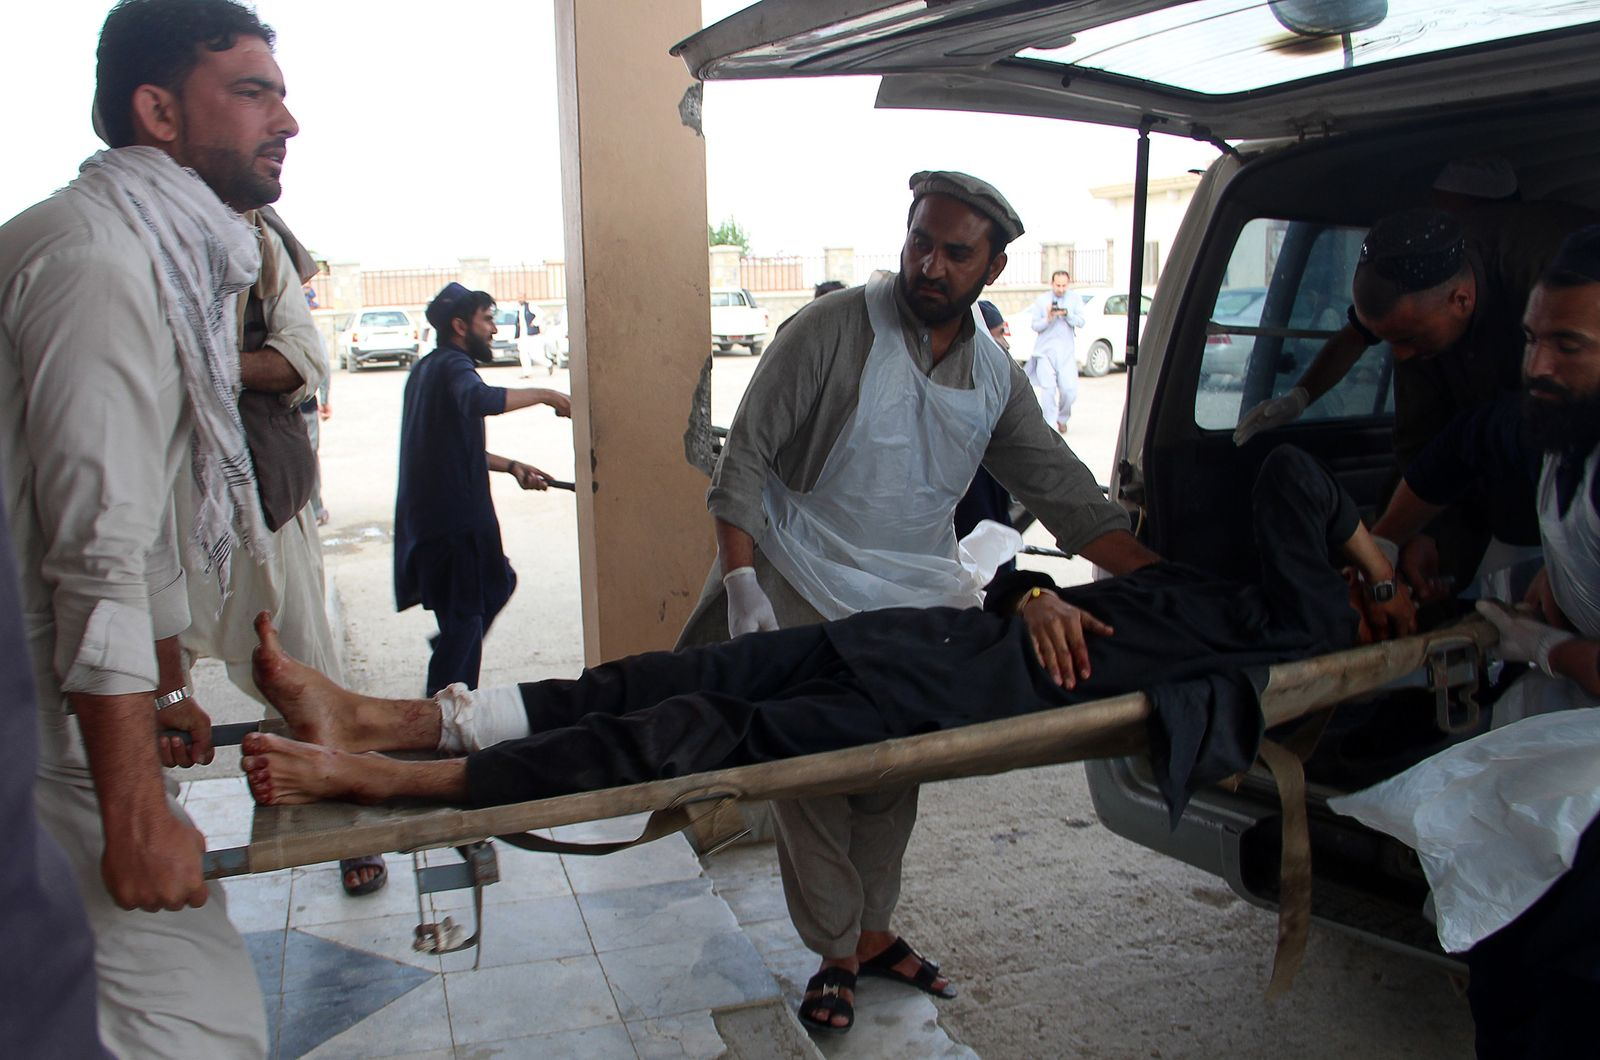 Afghanistan/ Anschlag/ Khost/ Chost